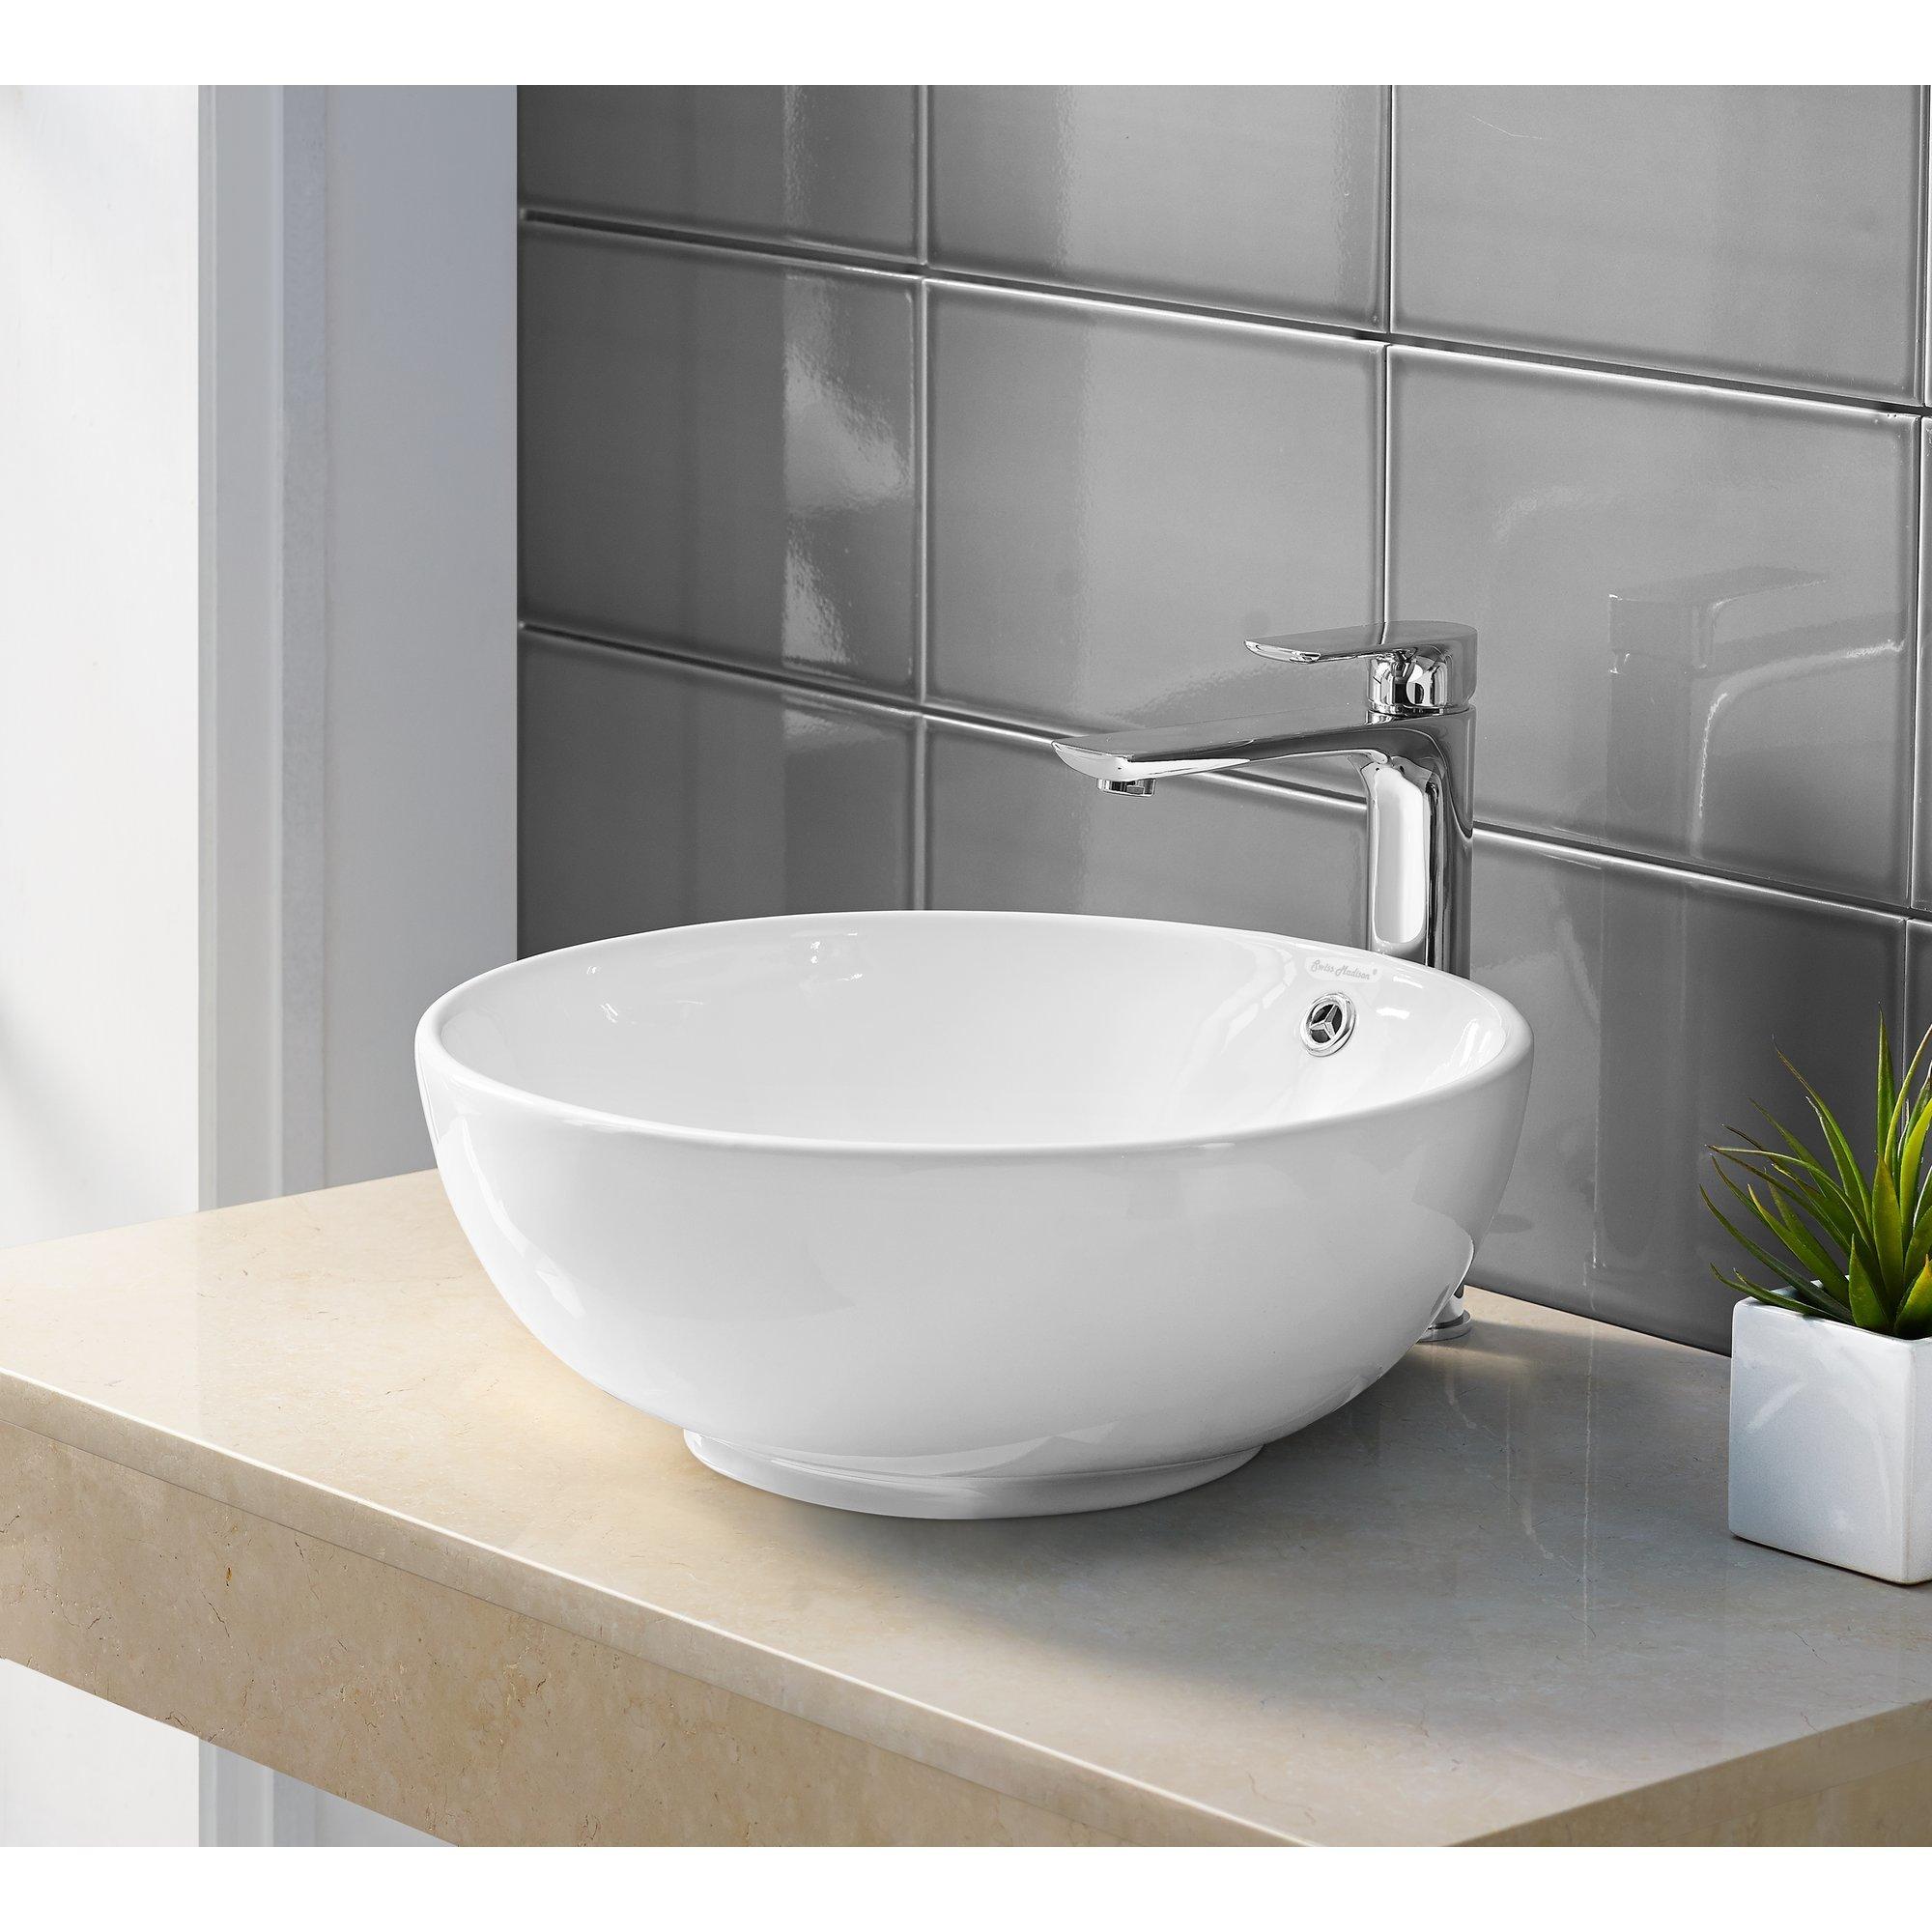 Round Ceramic Bathroom Vessel Sink